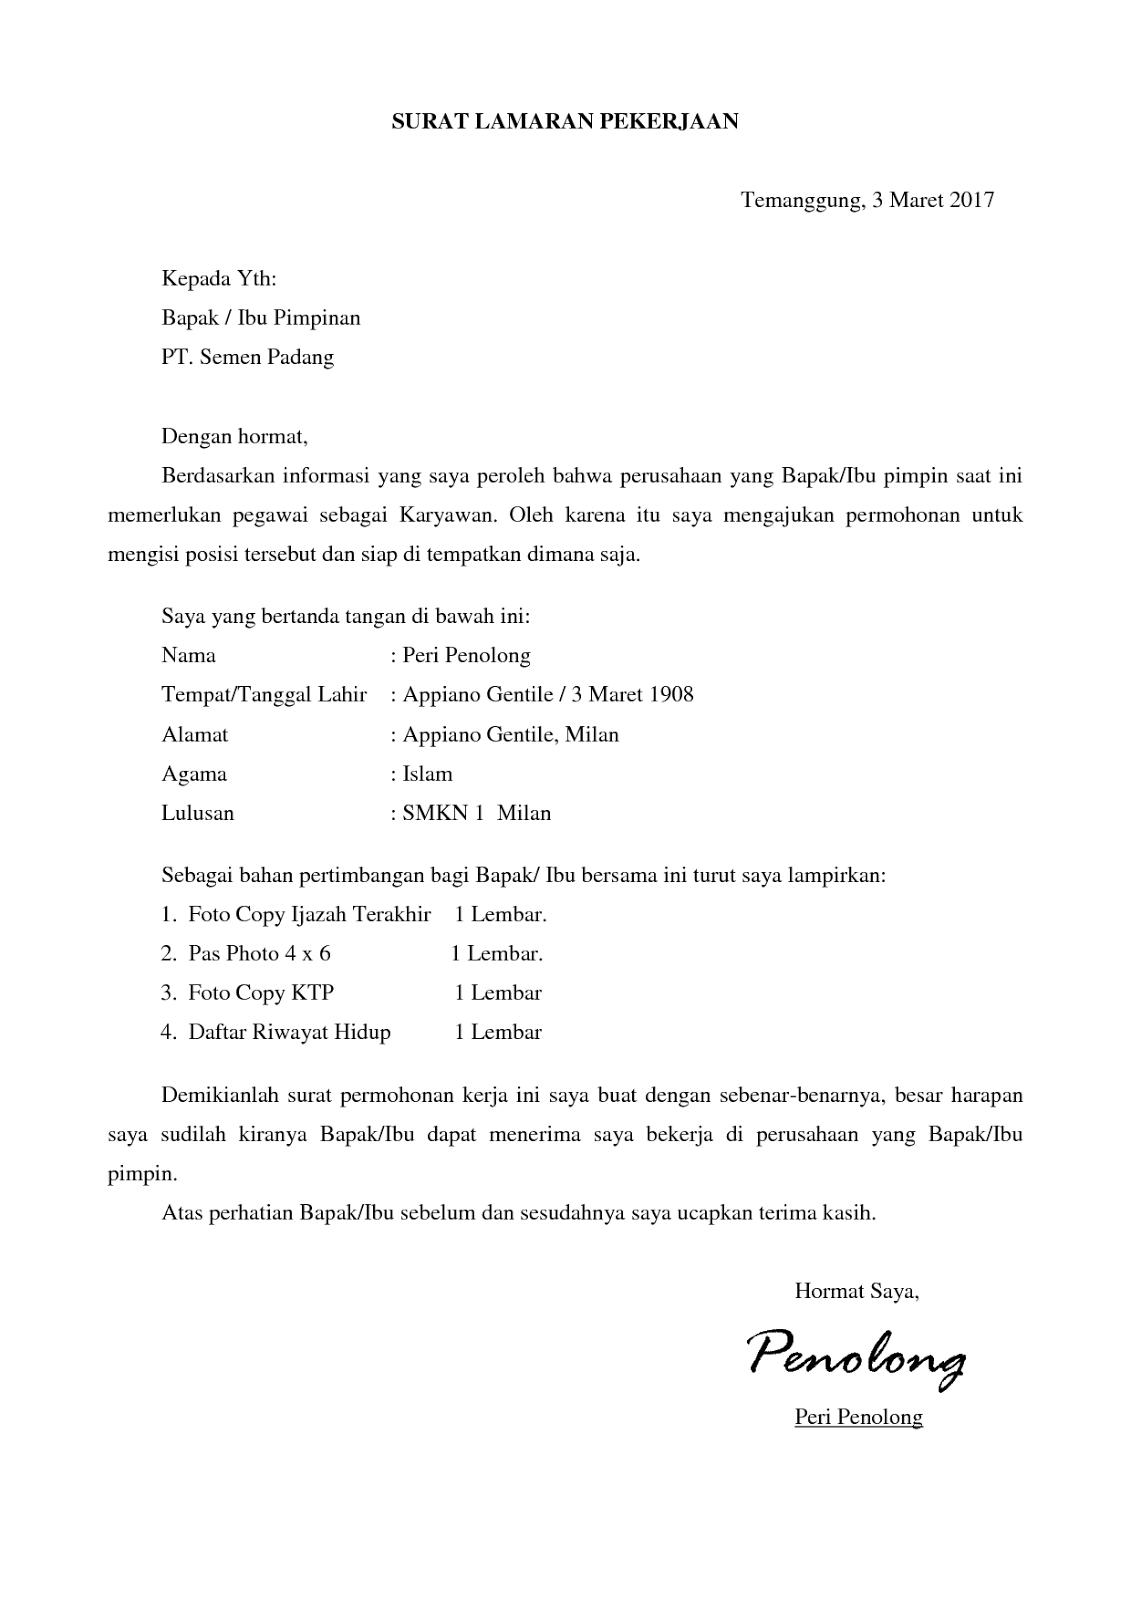 Surat Lamaran Kerja Kreatif Surat Cv Kreatif Desain Cv